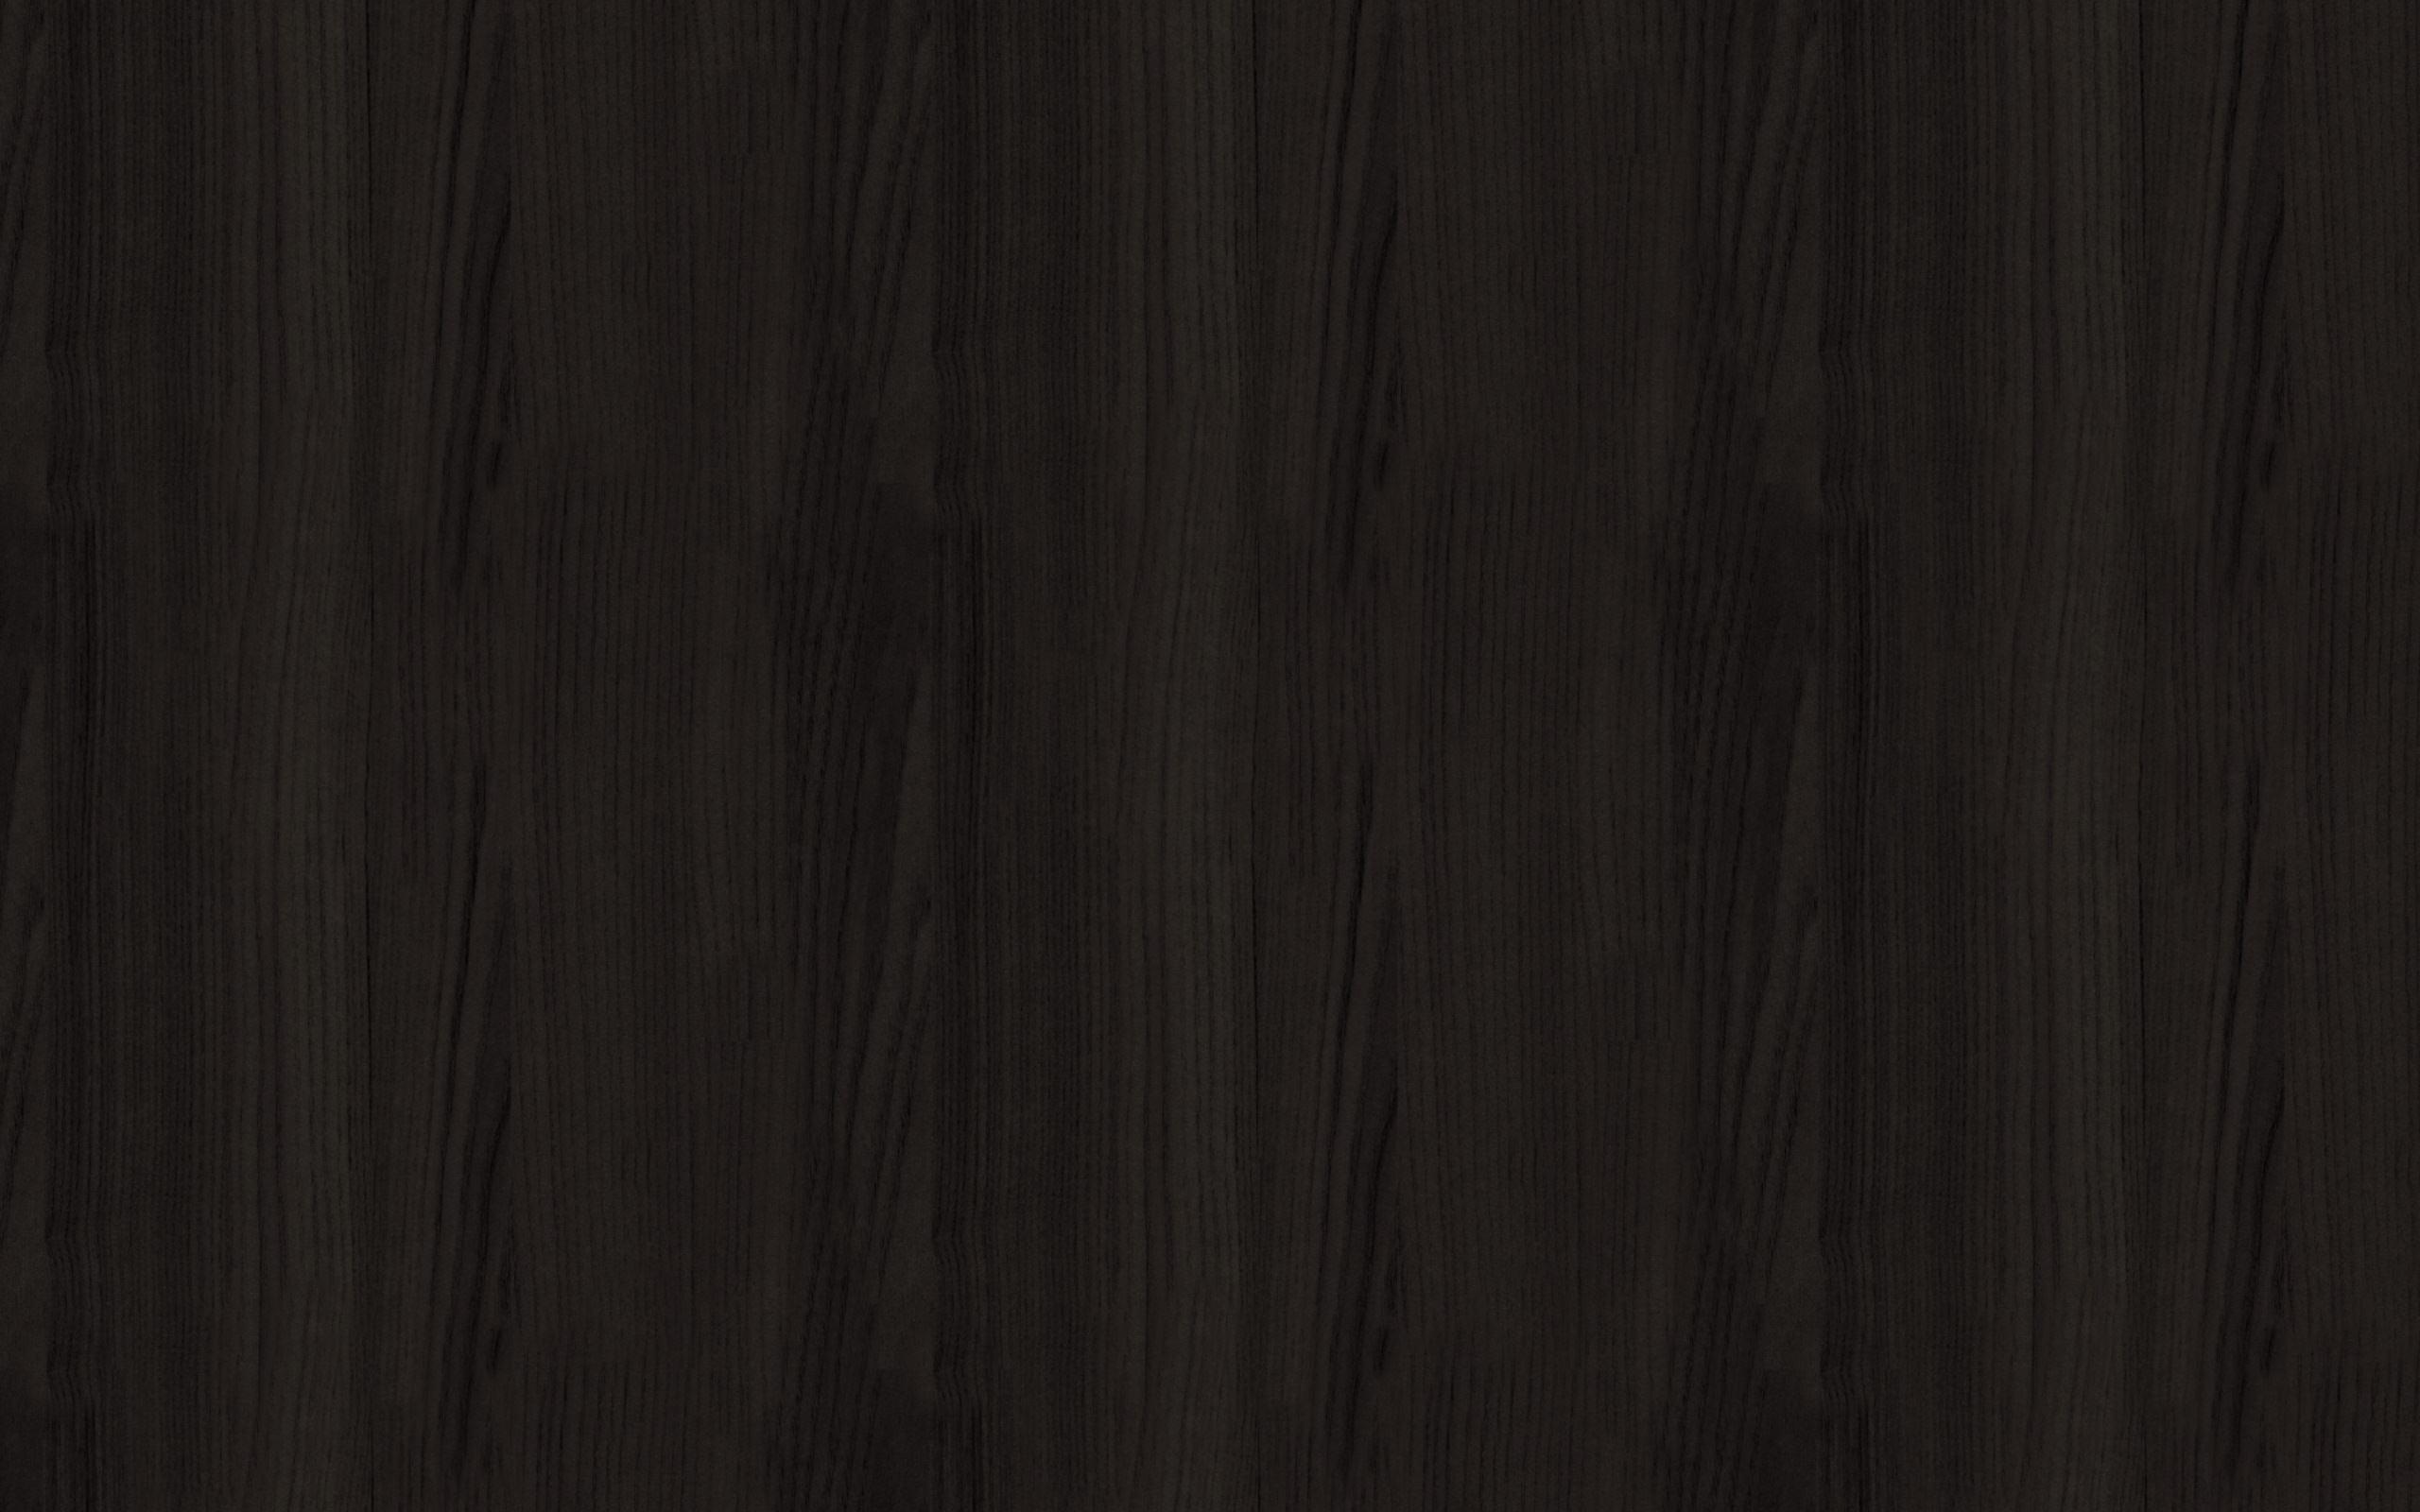 20 Wood Desktop Backgrounds Freecreatives